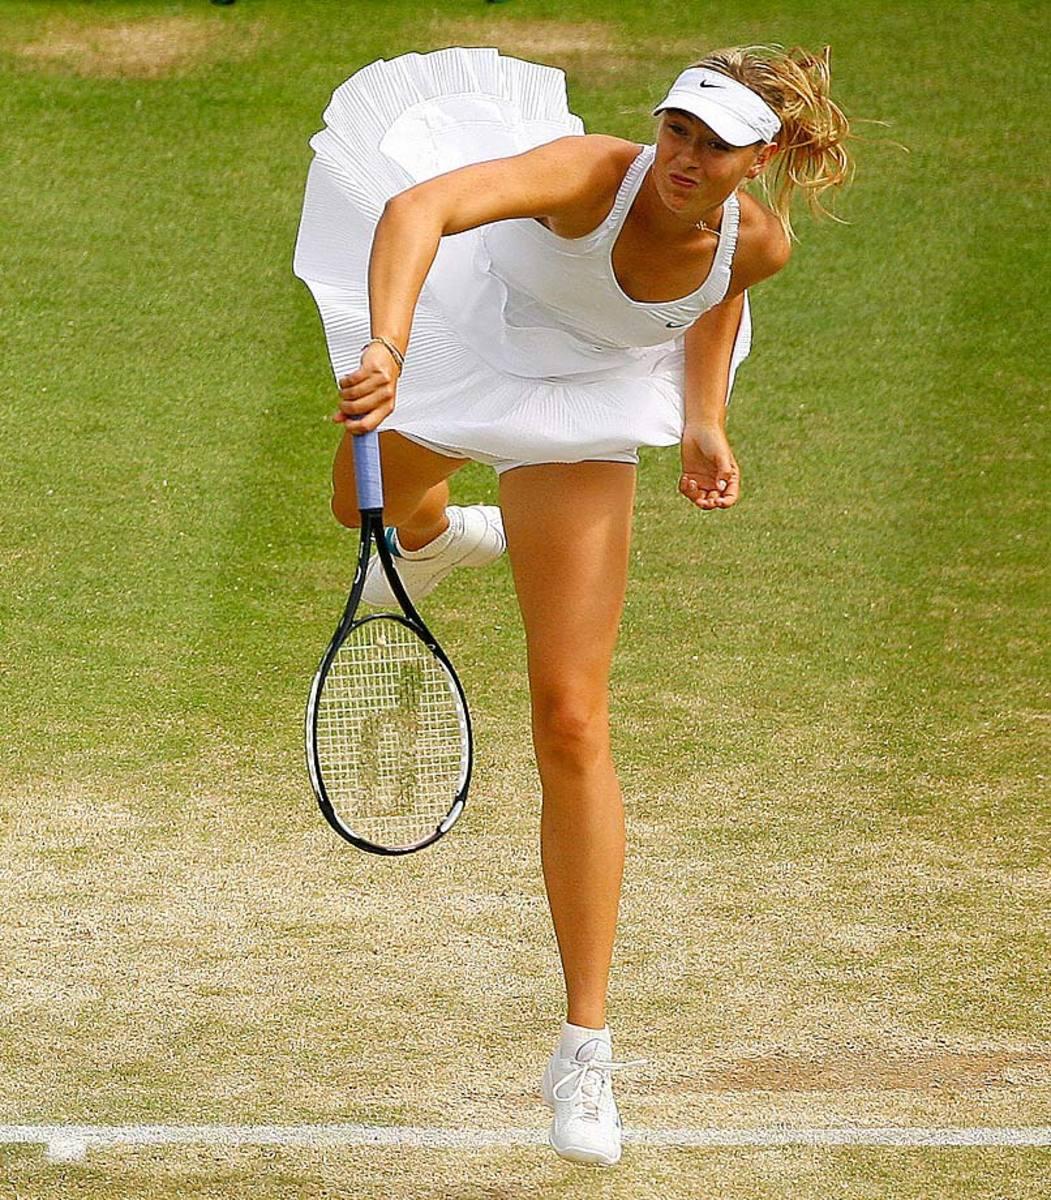 2007-Wimbledon-Maria-Sharapova.jpg